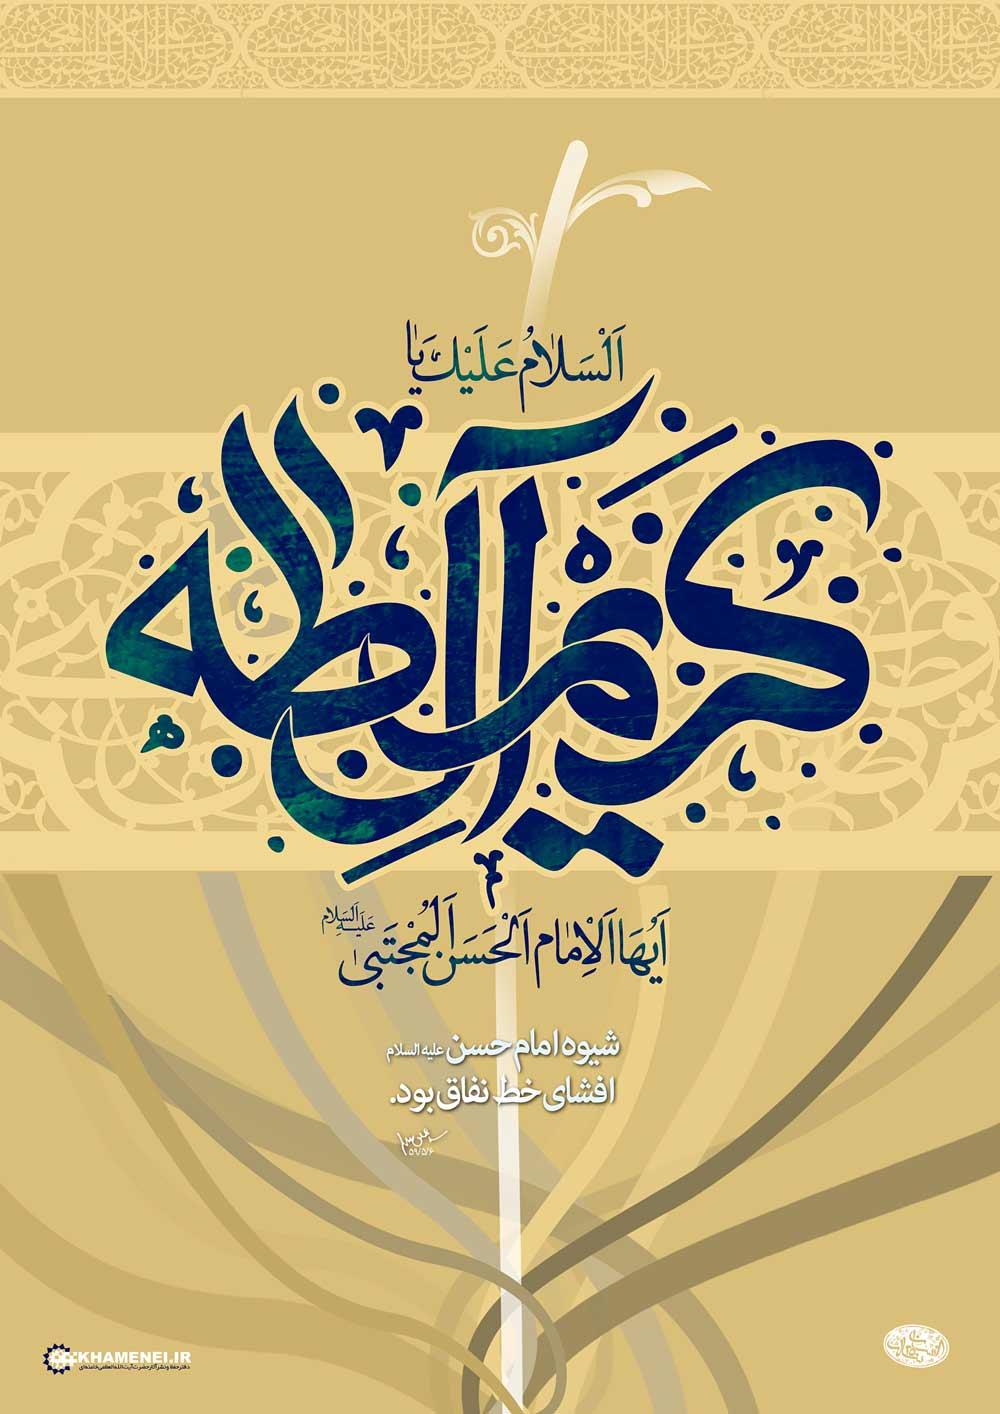 السلام علیک یا حسن ابن علی